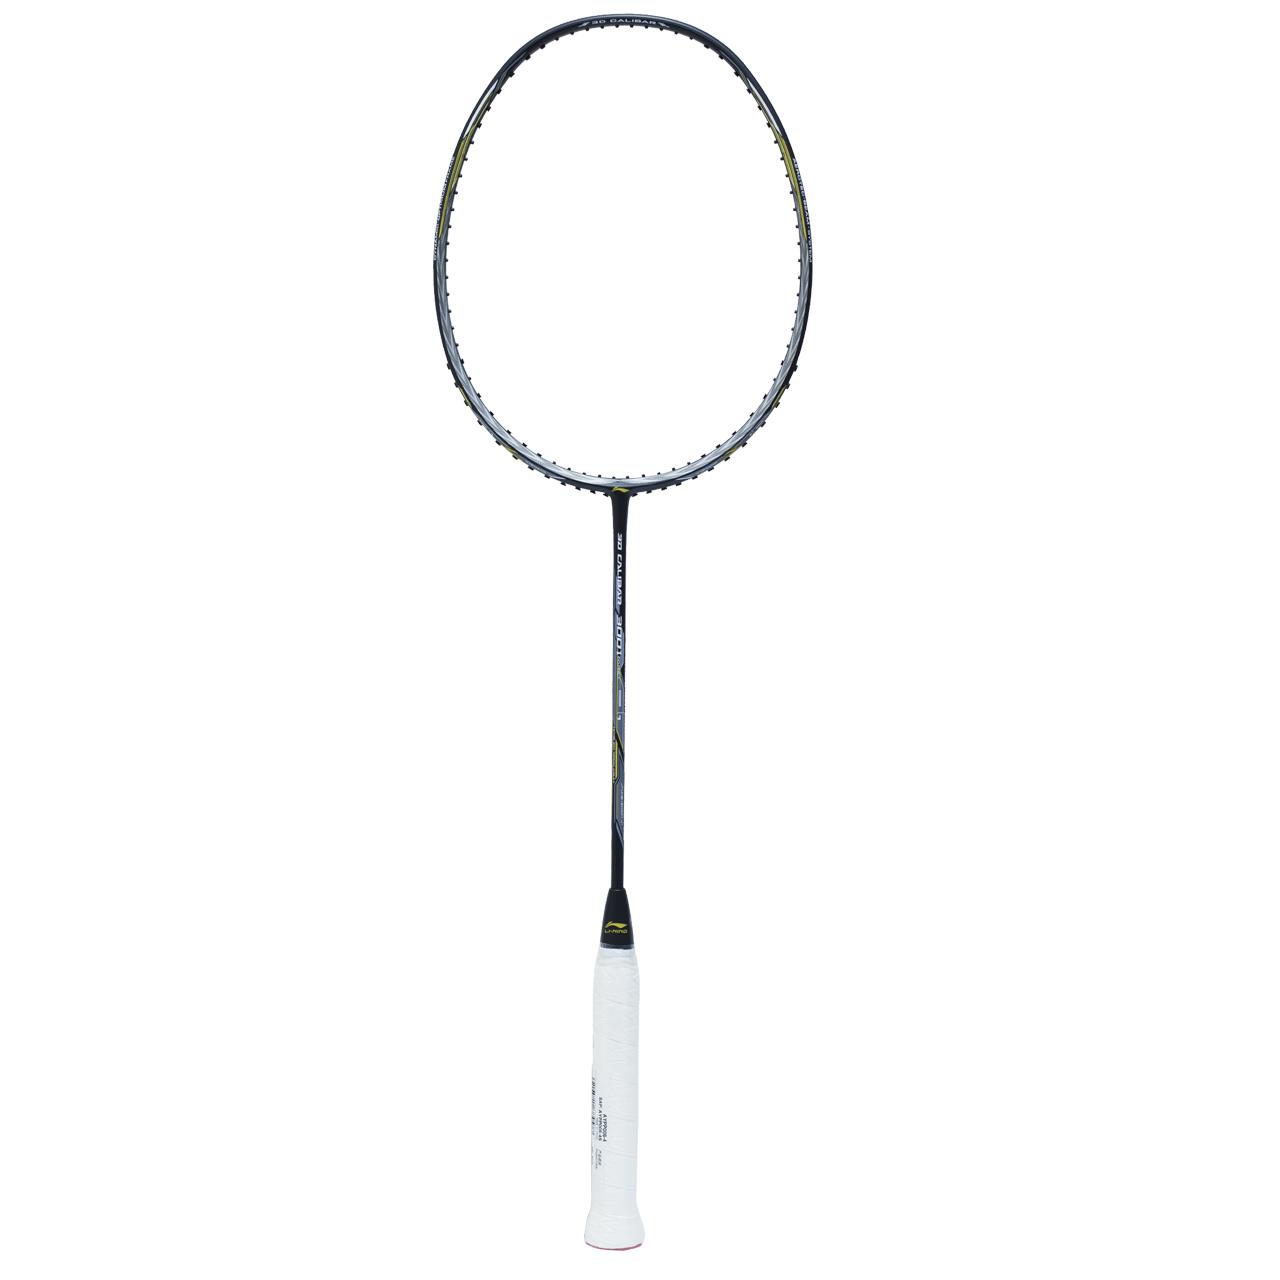 LI-NING 3D Calibar 300i Instinct Badminton Racquet